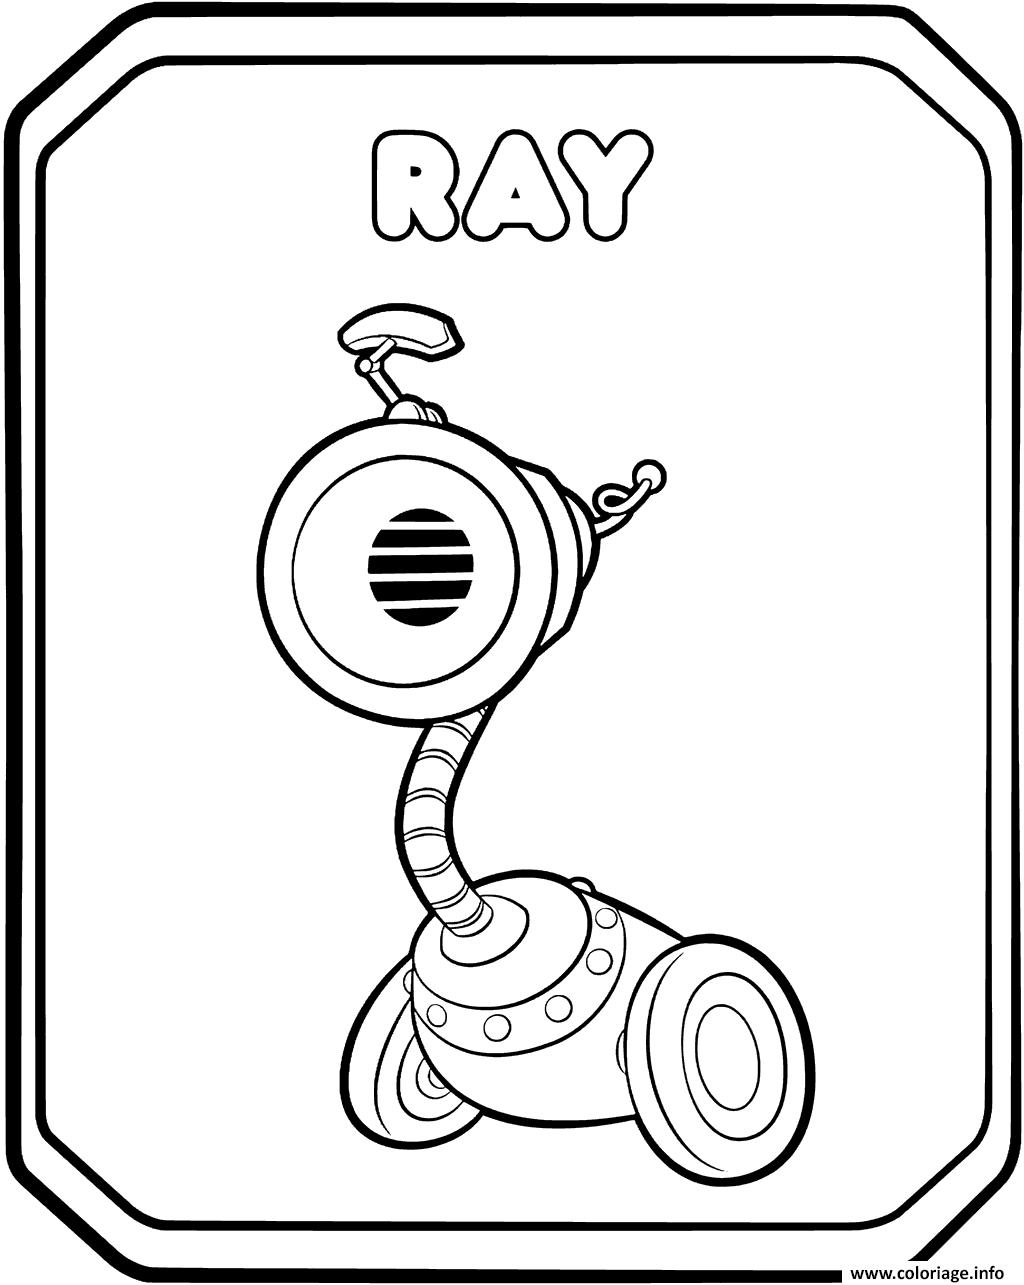 Dessin Rusty Rivets Characters Ray Coloriage Gratuit à Imprimer